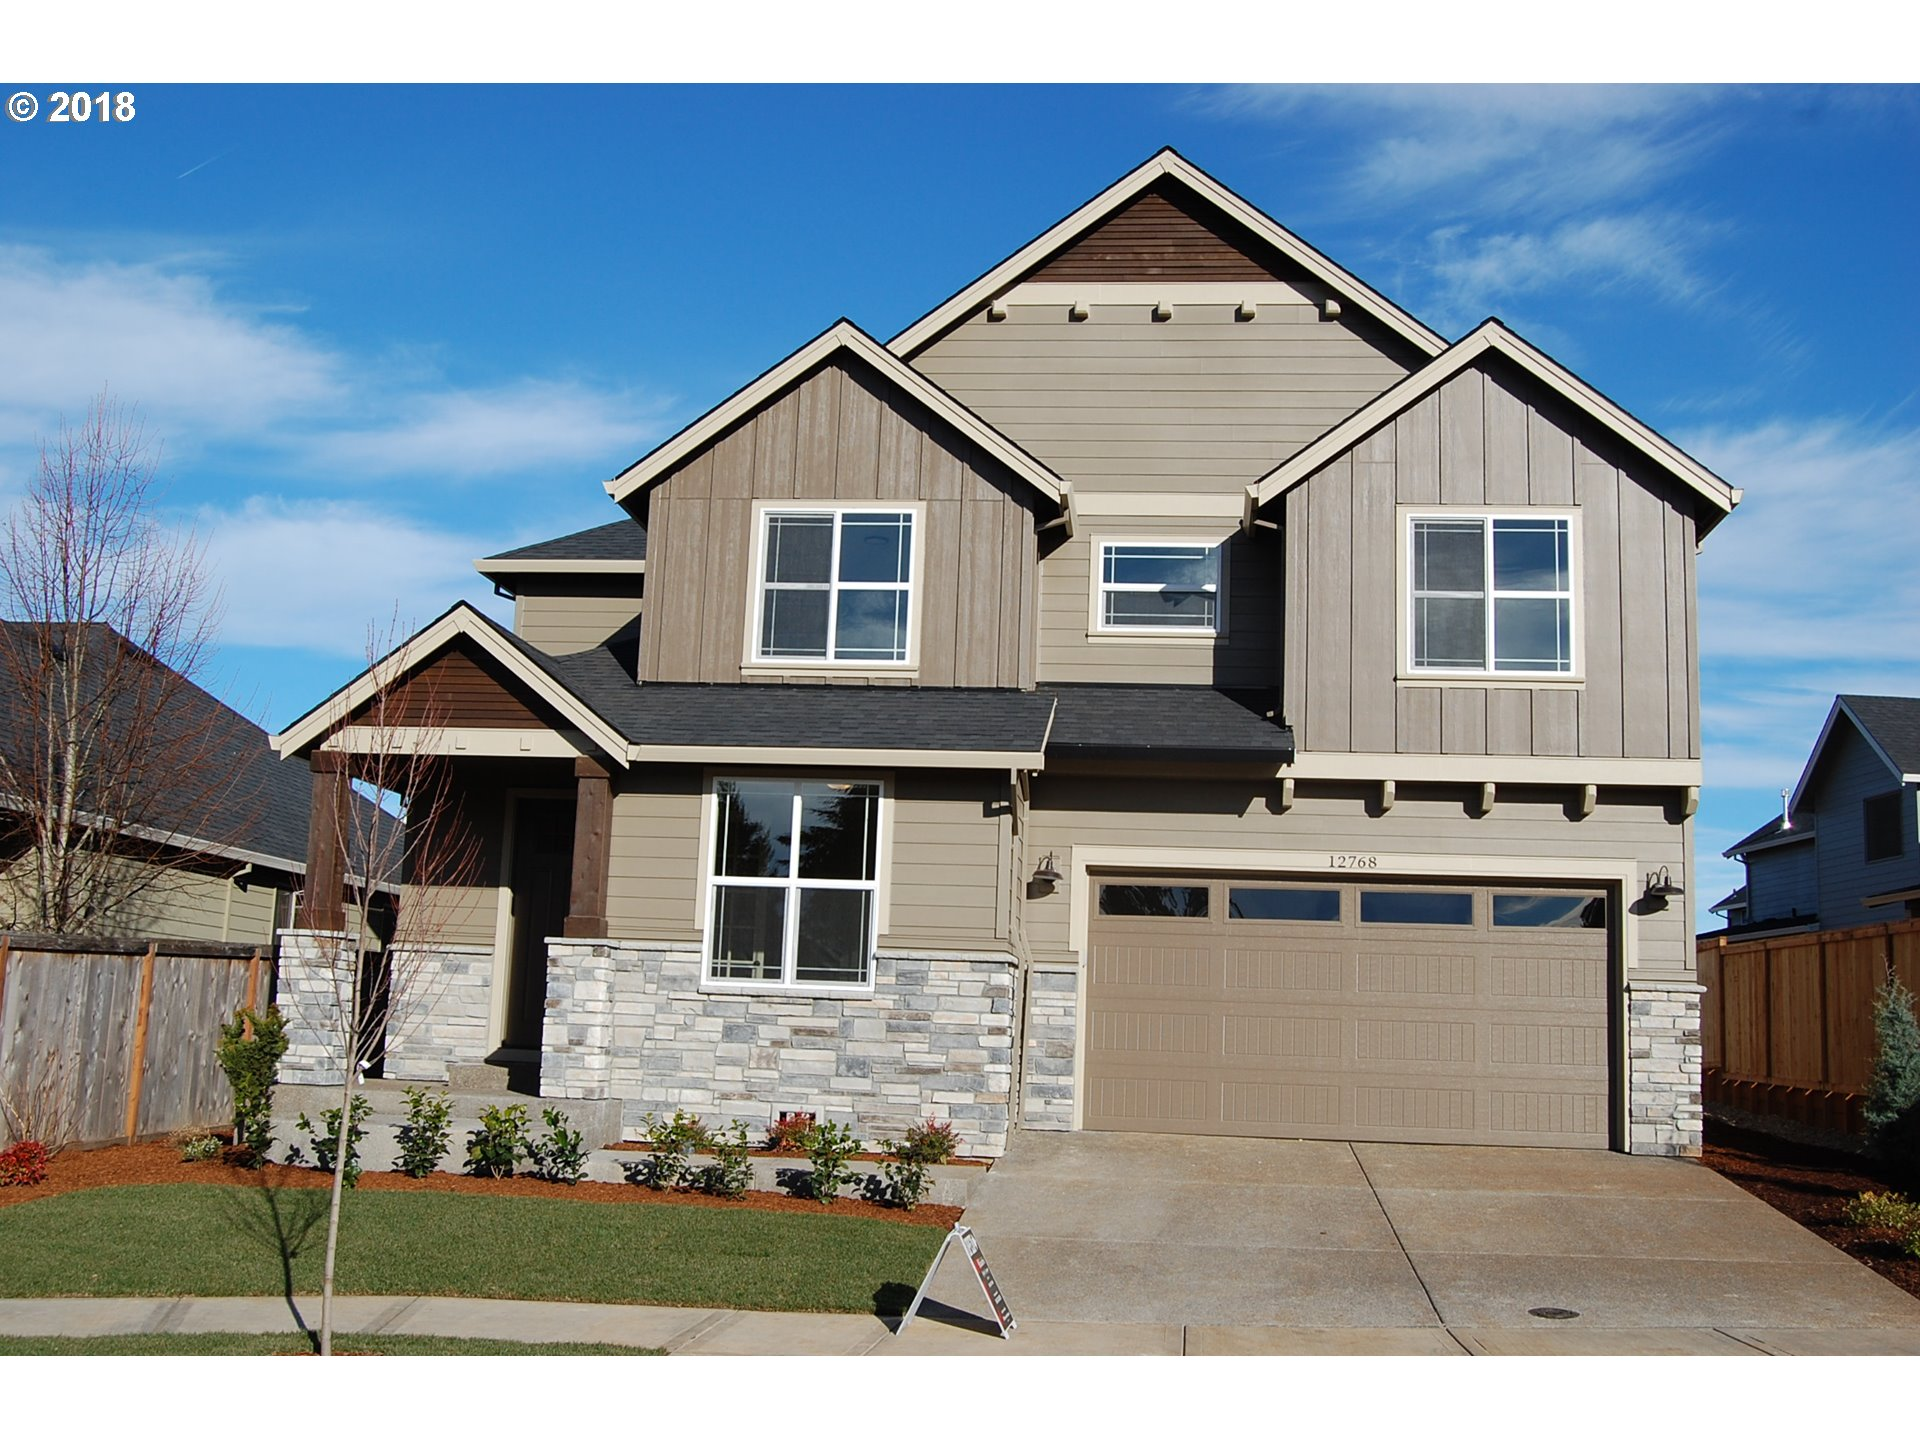 12768 ANITA PL L111 OREGON CITY OR 97045 Oregon City Realtor